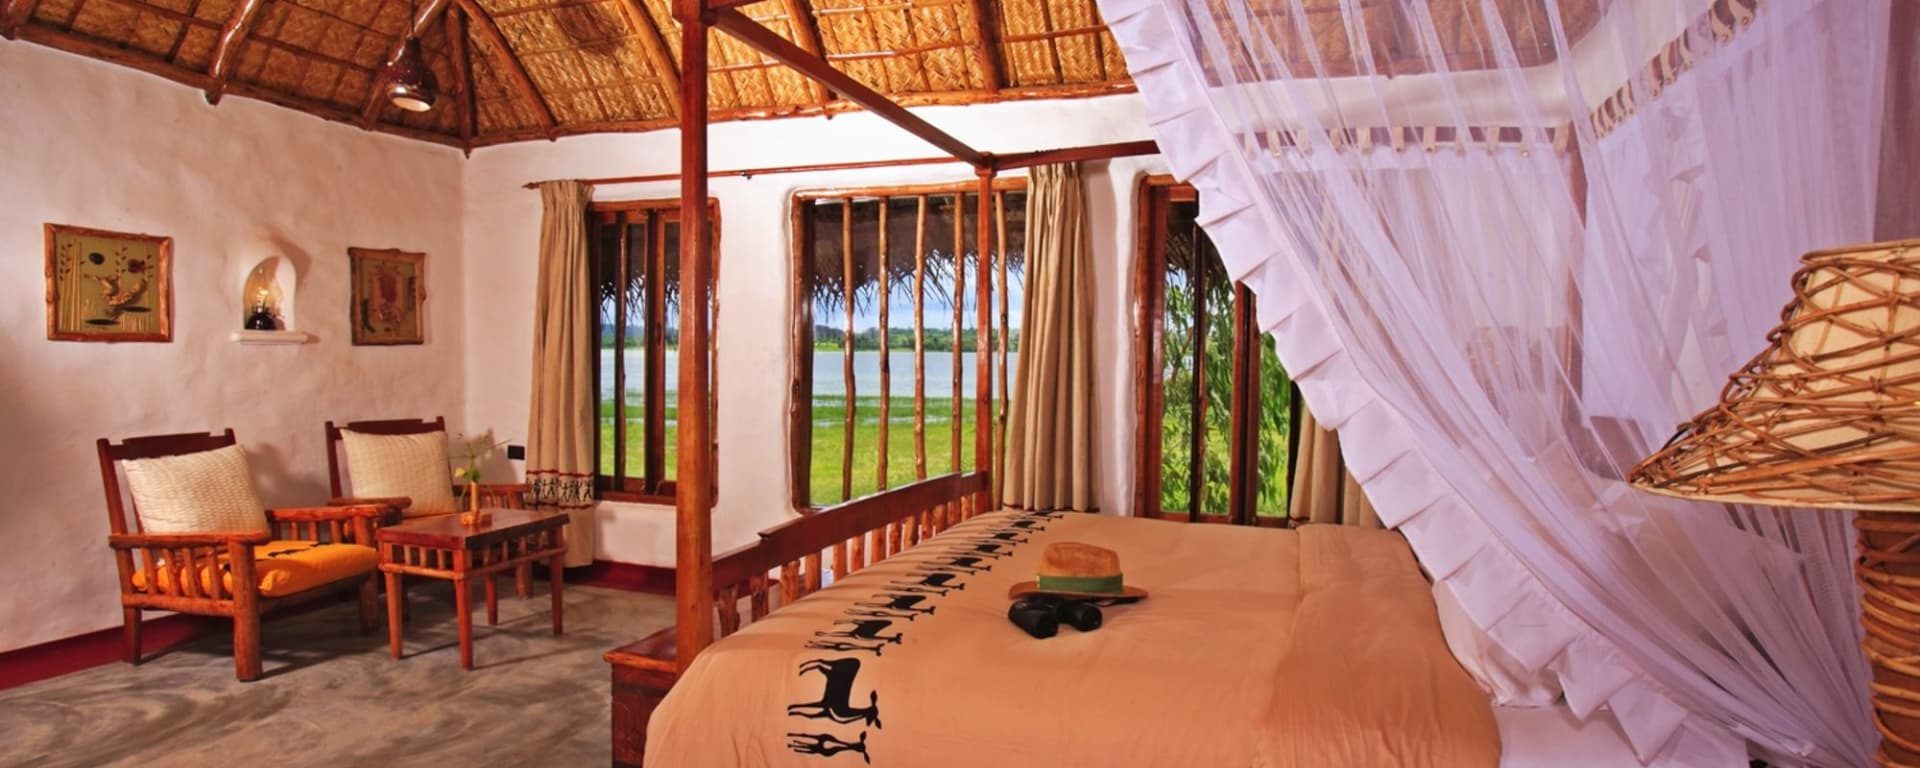 Evolve Back Kuruba Safari Lodge à Parc national de Nagarhole: Pool Hut | Bedroom